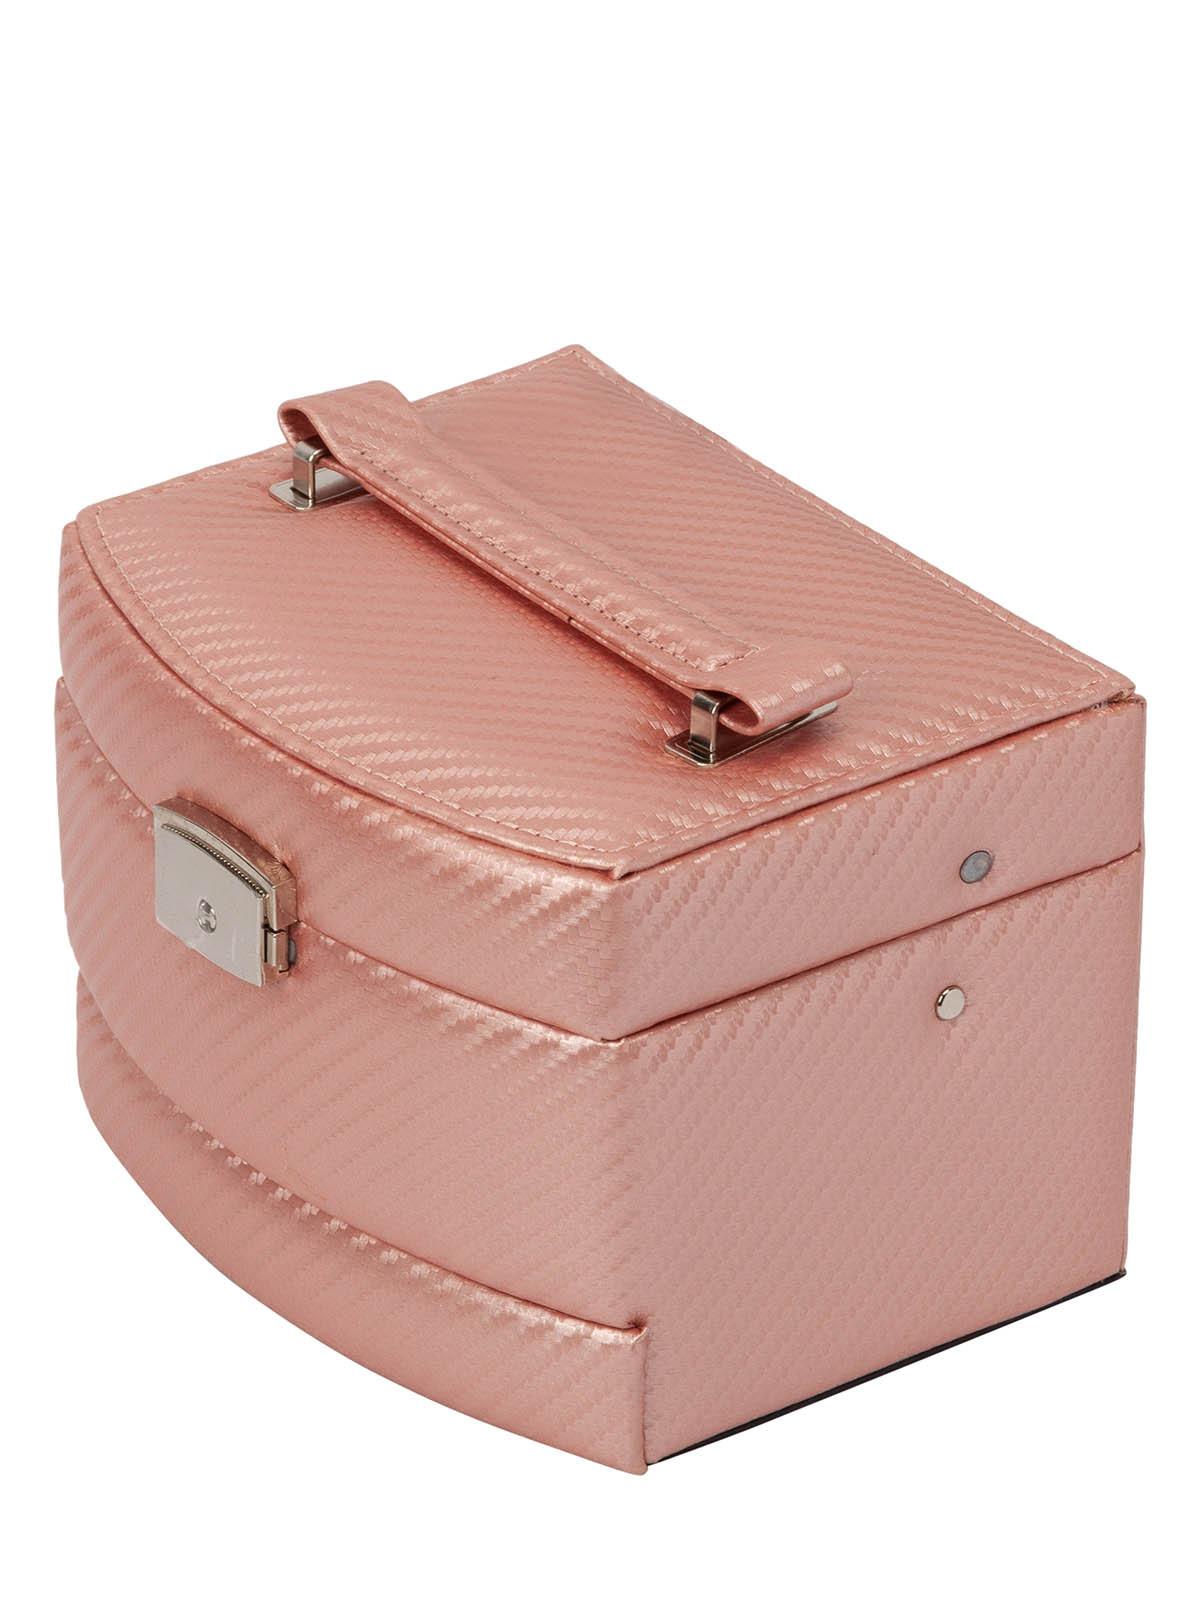 Шкатулка для украшений S-501D-6PW светло-розовый